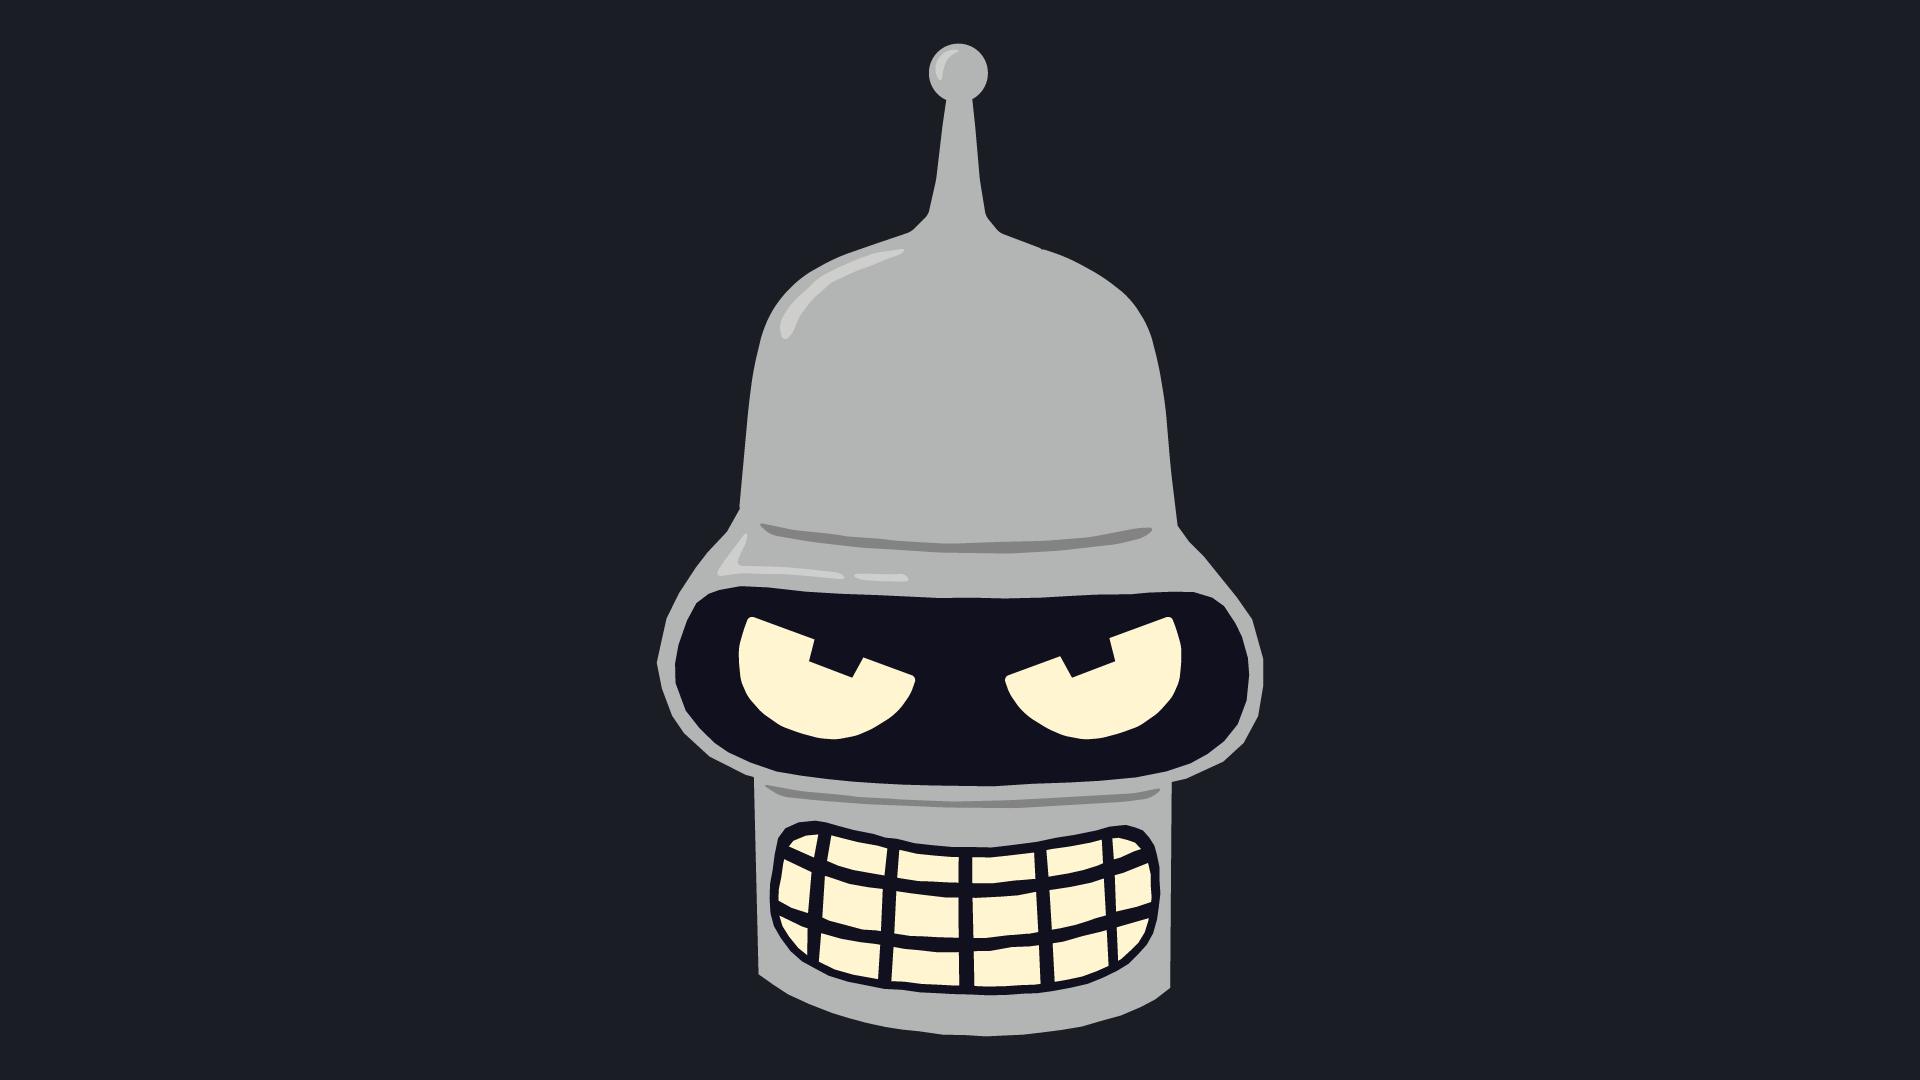 1920x1080 Bender From Futurama Vector Art Bender Futurama